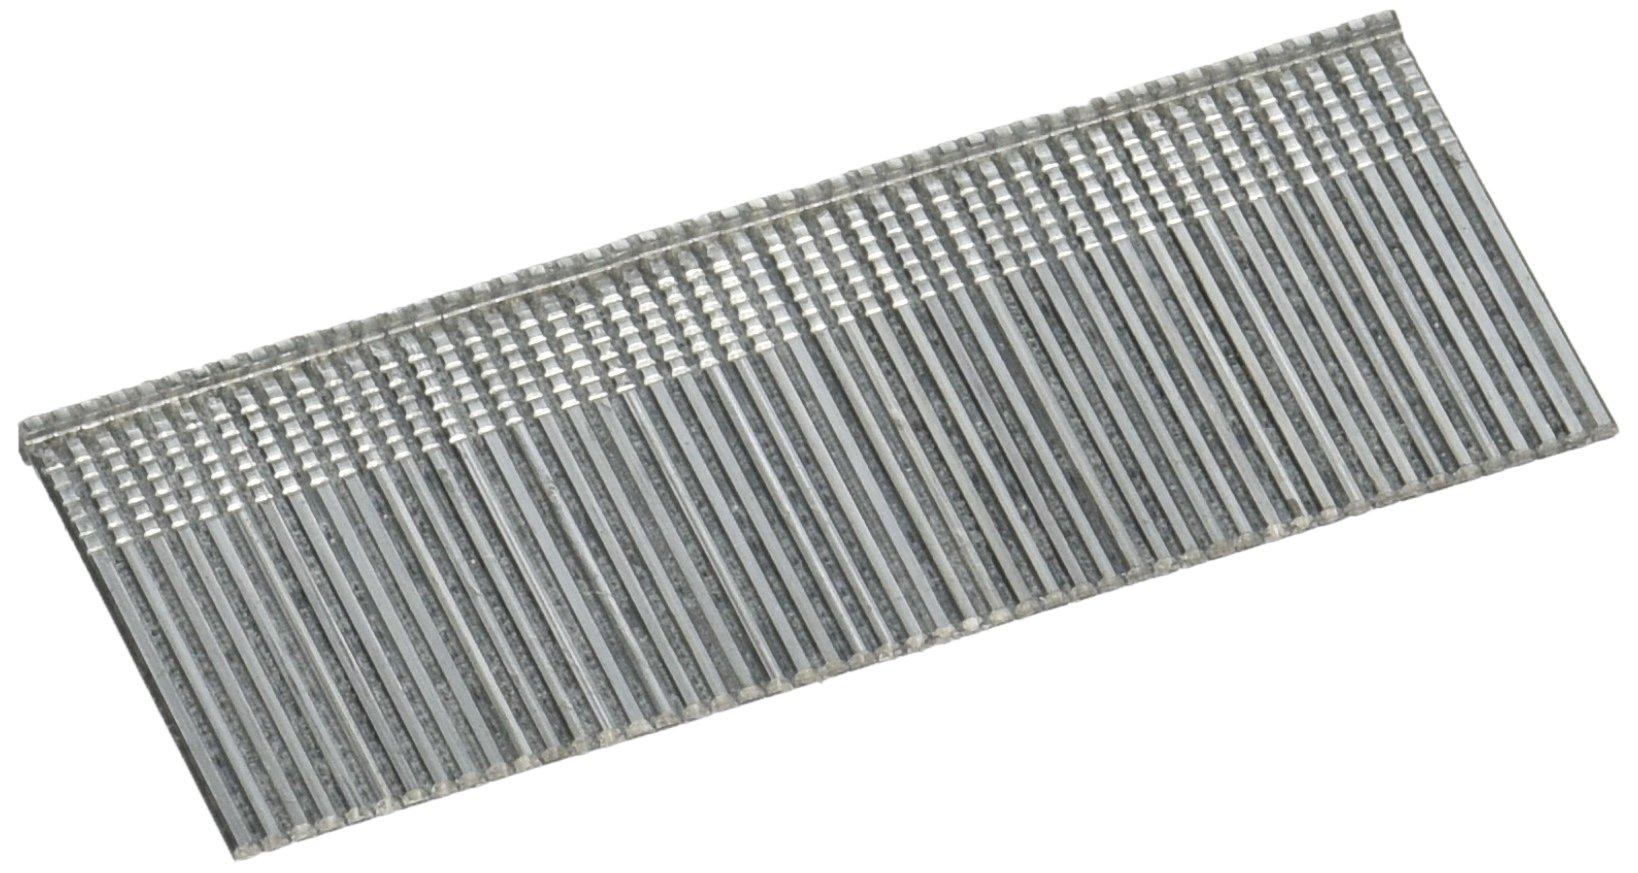 BOSTITCH SB16-1.25-1M 1-1/4-Inch by 16 Gauge Bright Finish Nail (1,000 per Box)